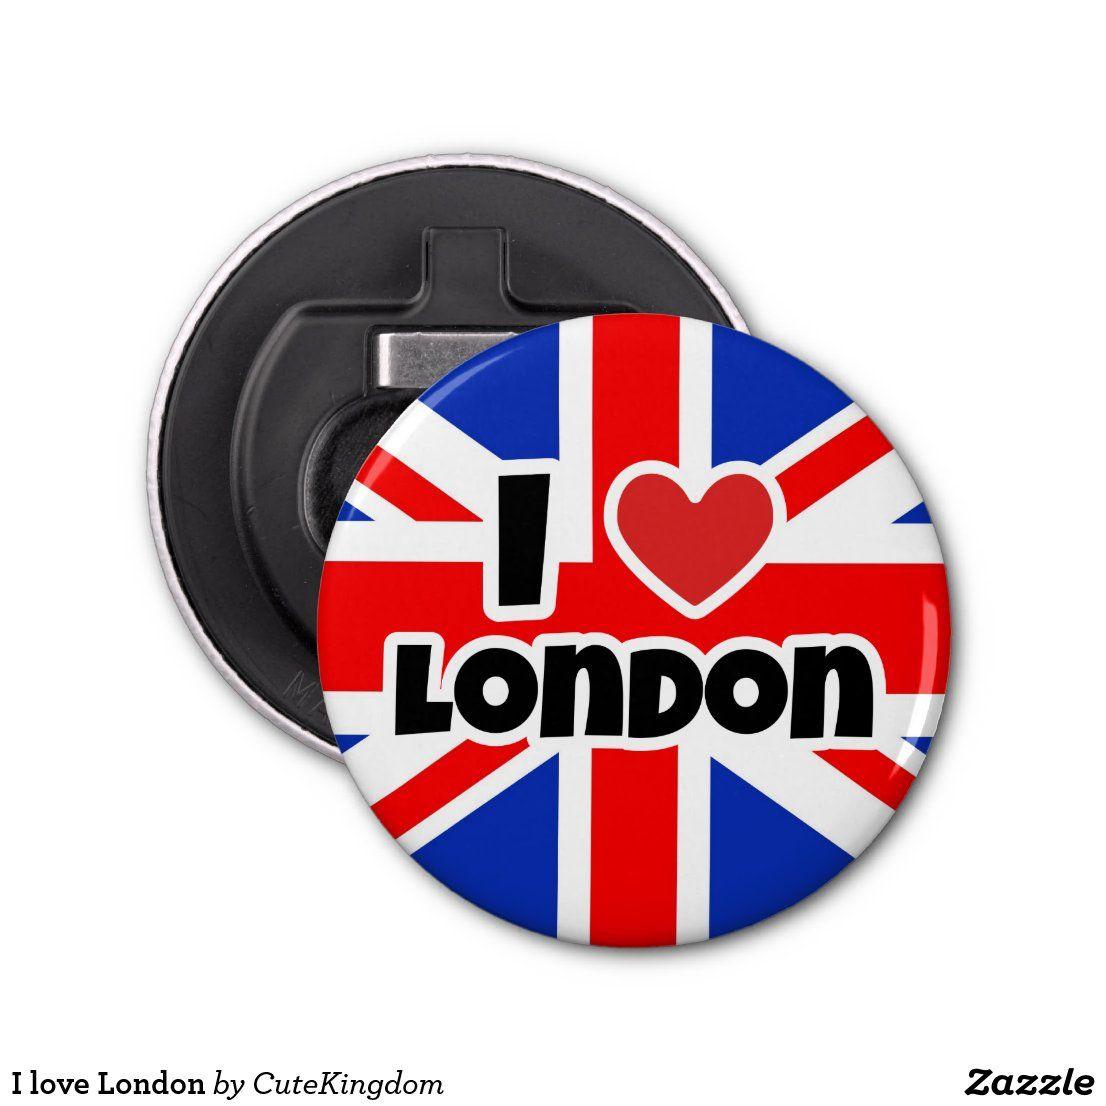 I Love London Bottle Opener Zazzle Com In 2020 London Love Custom Holiday Card Bottle